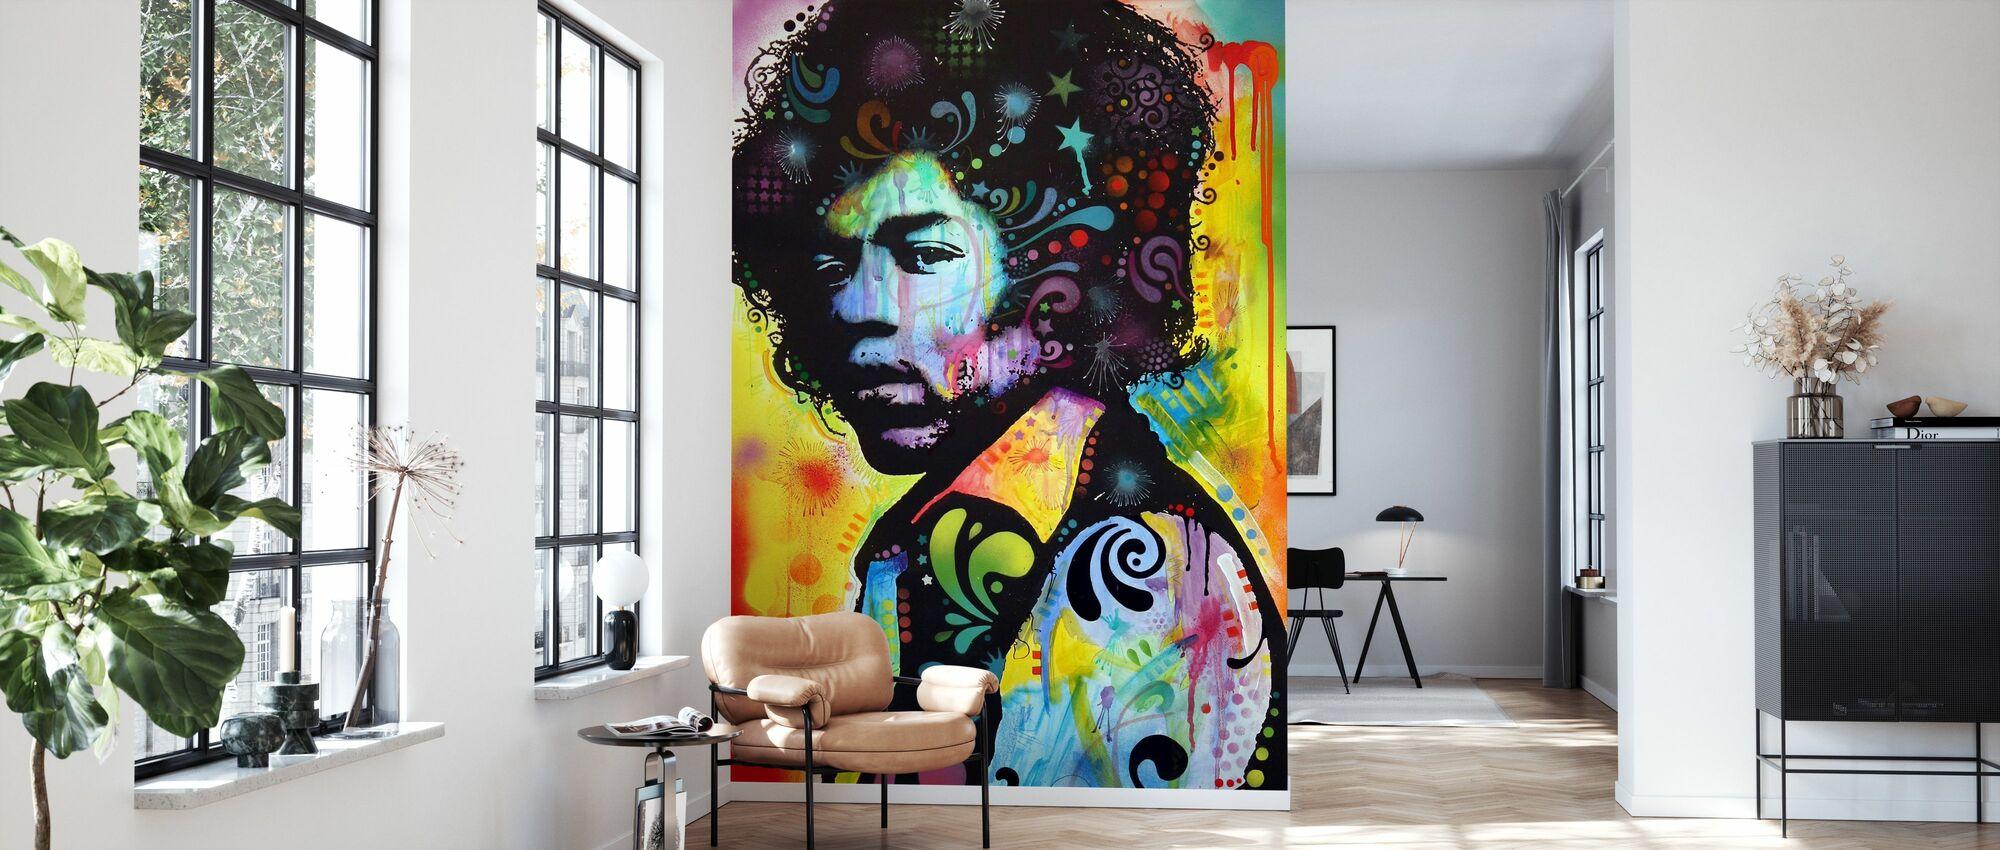 Hendrix - Wallpaper - Living Room